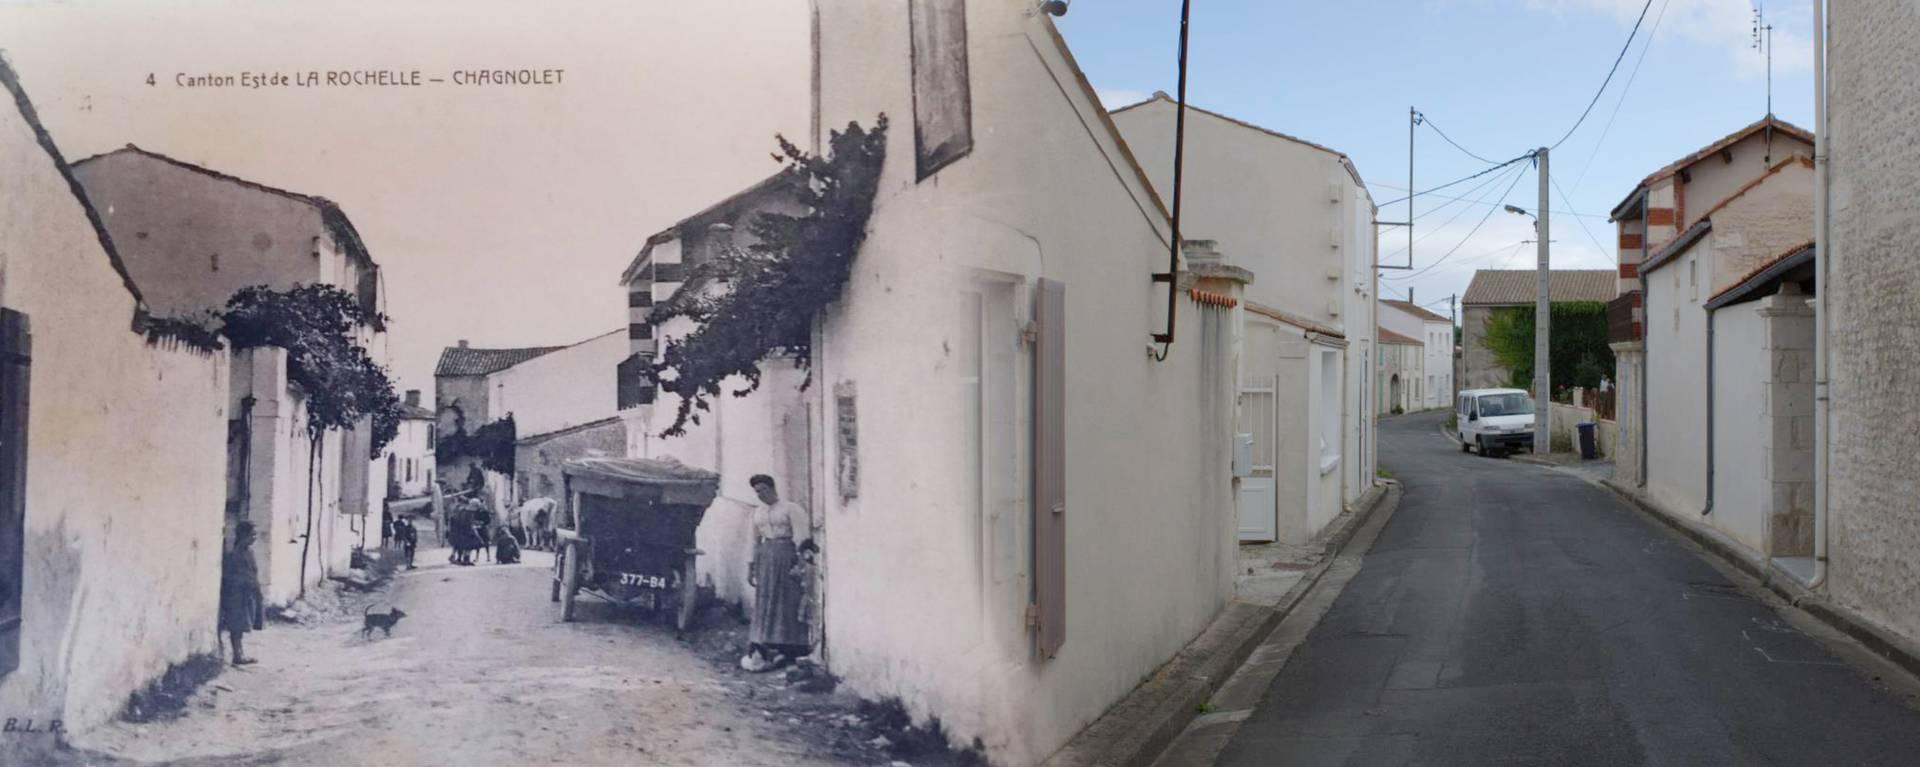 Photos de la Grande Rue de Chagnolet (avant/après)